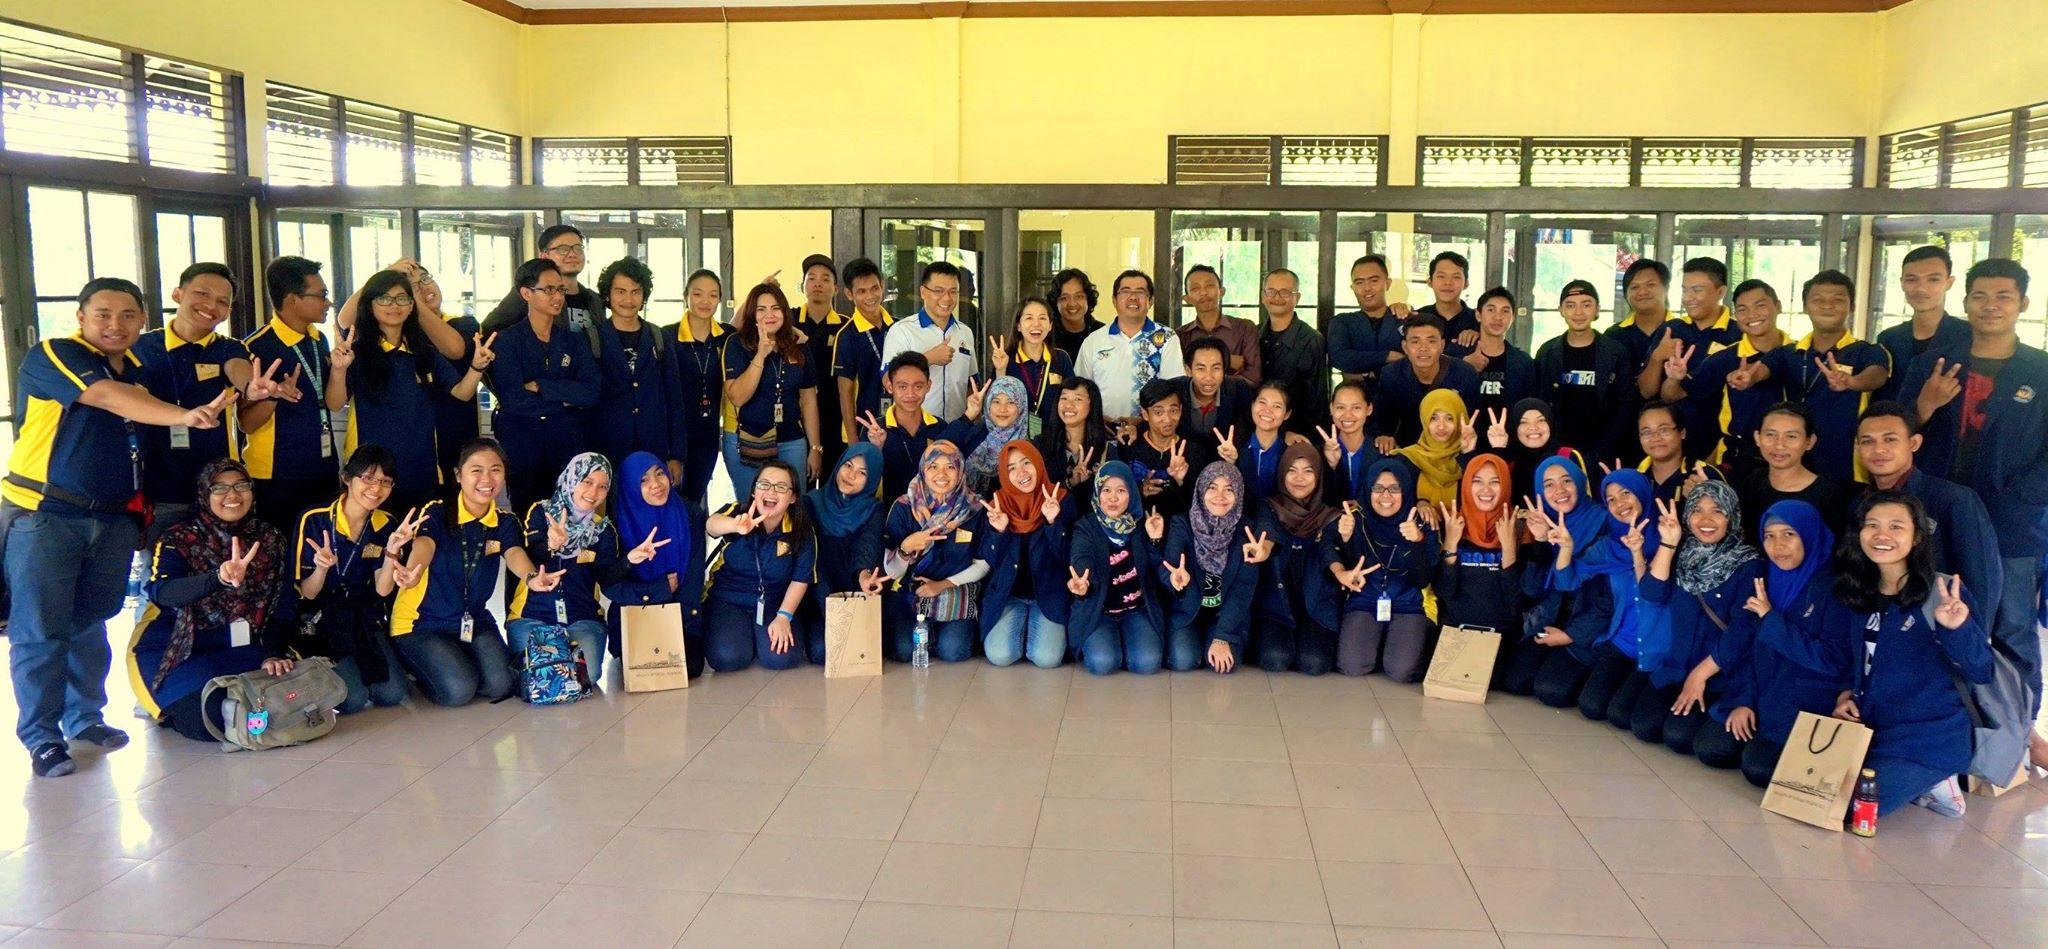 To The Coast Tanjung Datu National Park Where Borneo Begins Pub Ge Produk Ukm Bumntravel Tissue Ibec Public